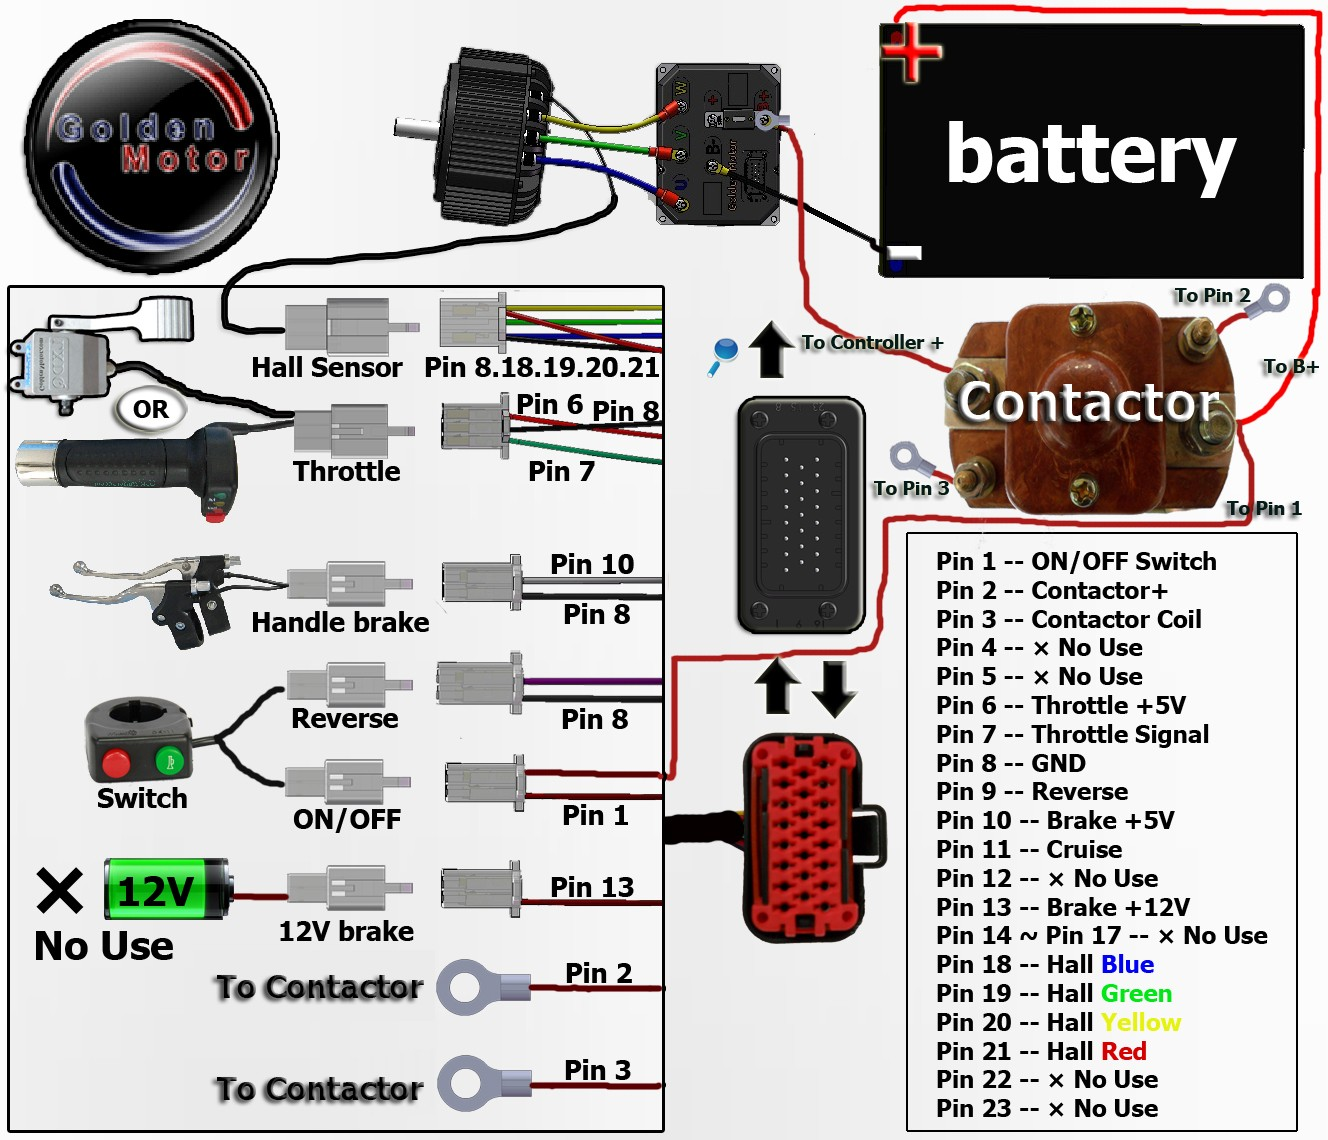 Hub Motor Controller Circuit Diagram Wiring Image Control 10kw Bldc From Golden Model Hpm Aeva Forums Rh Asn Au Kelly